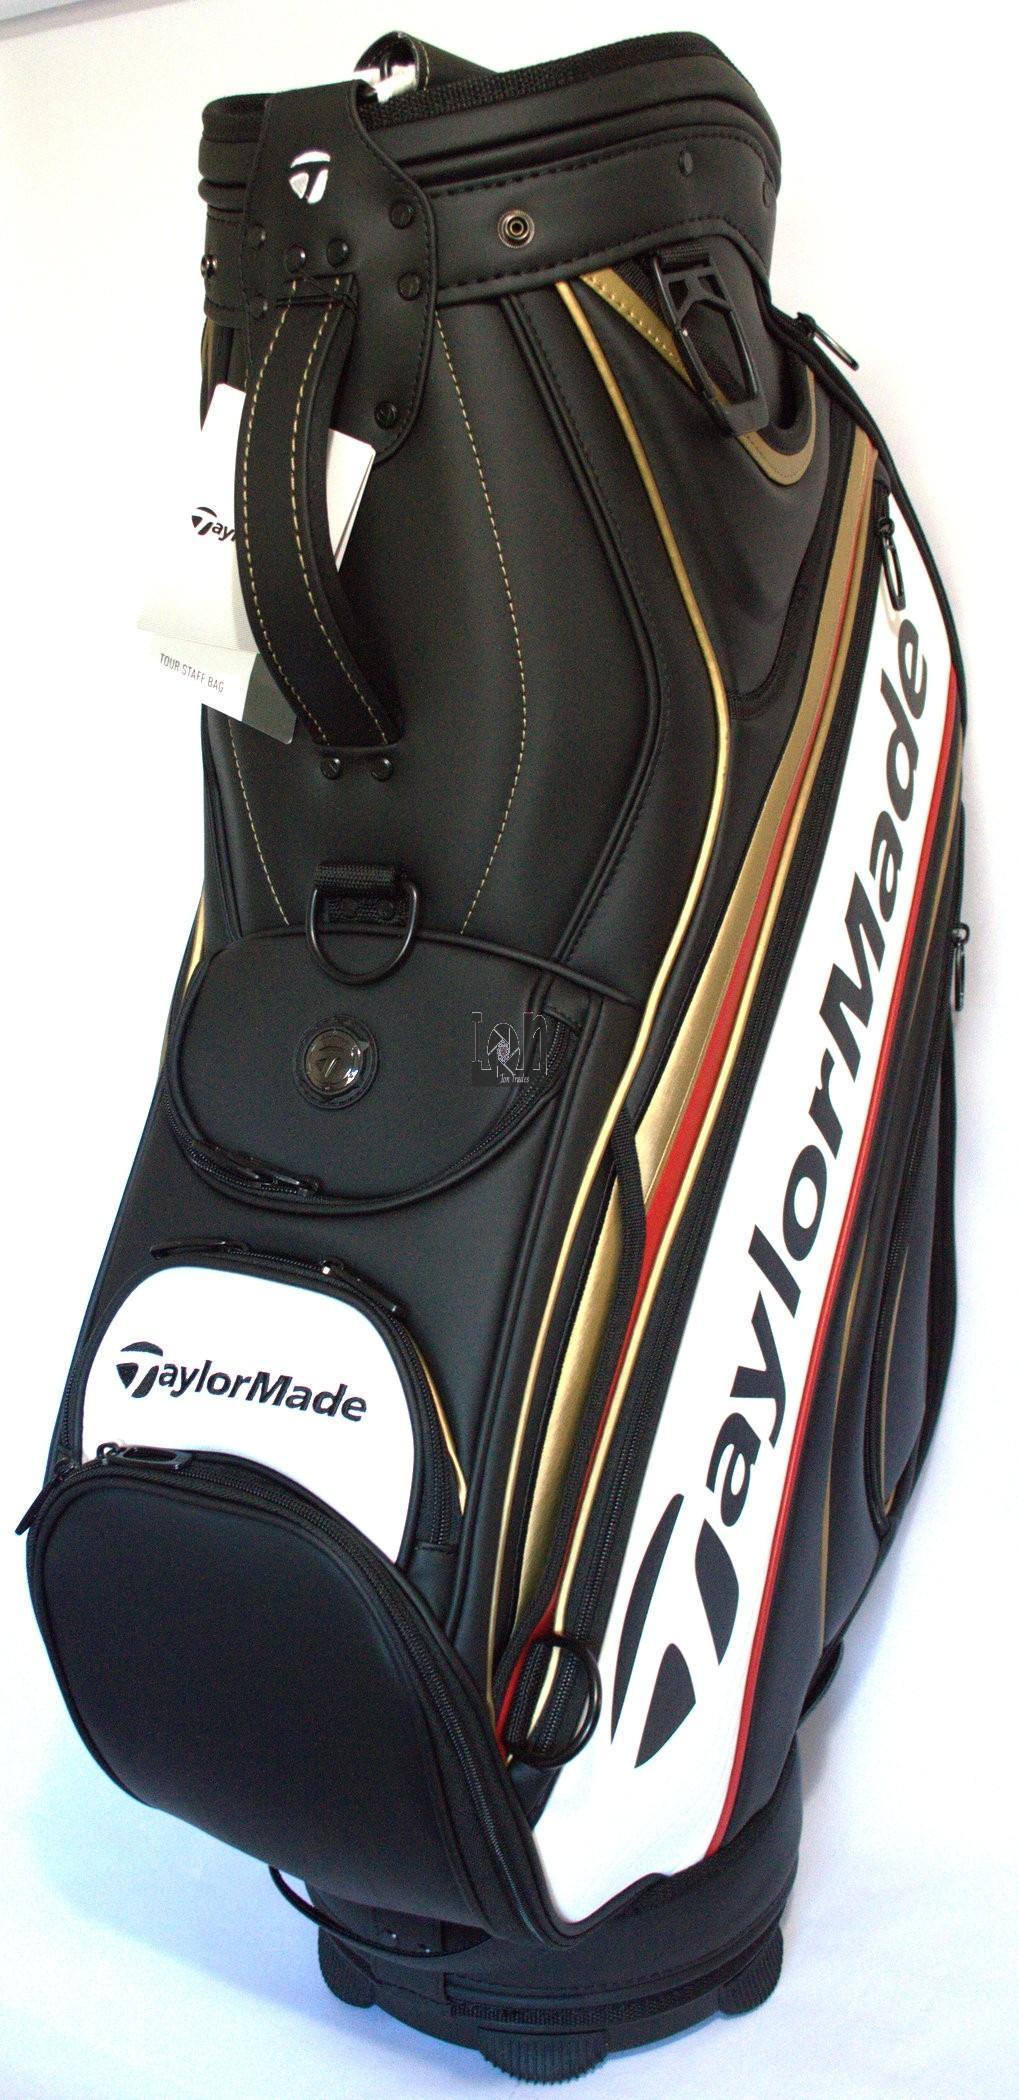 Taylormade Tour Staff Bag 2016 Black White Gold Red Golf Club Bag